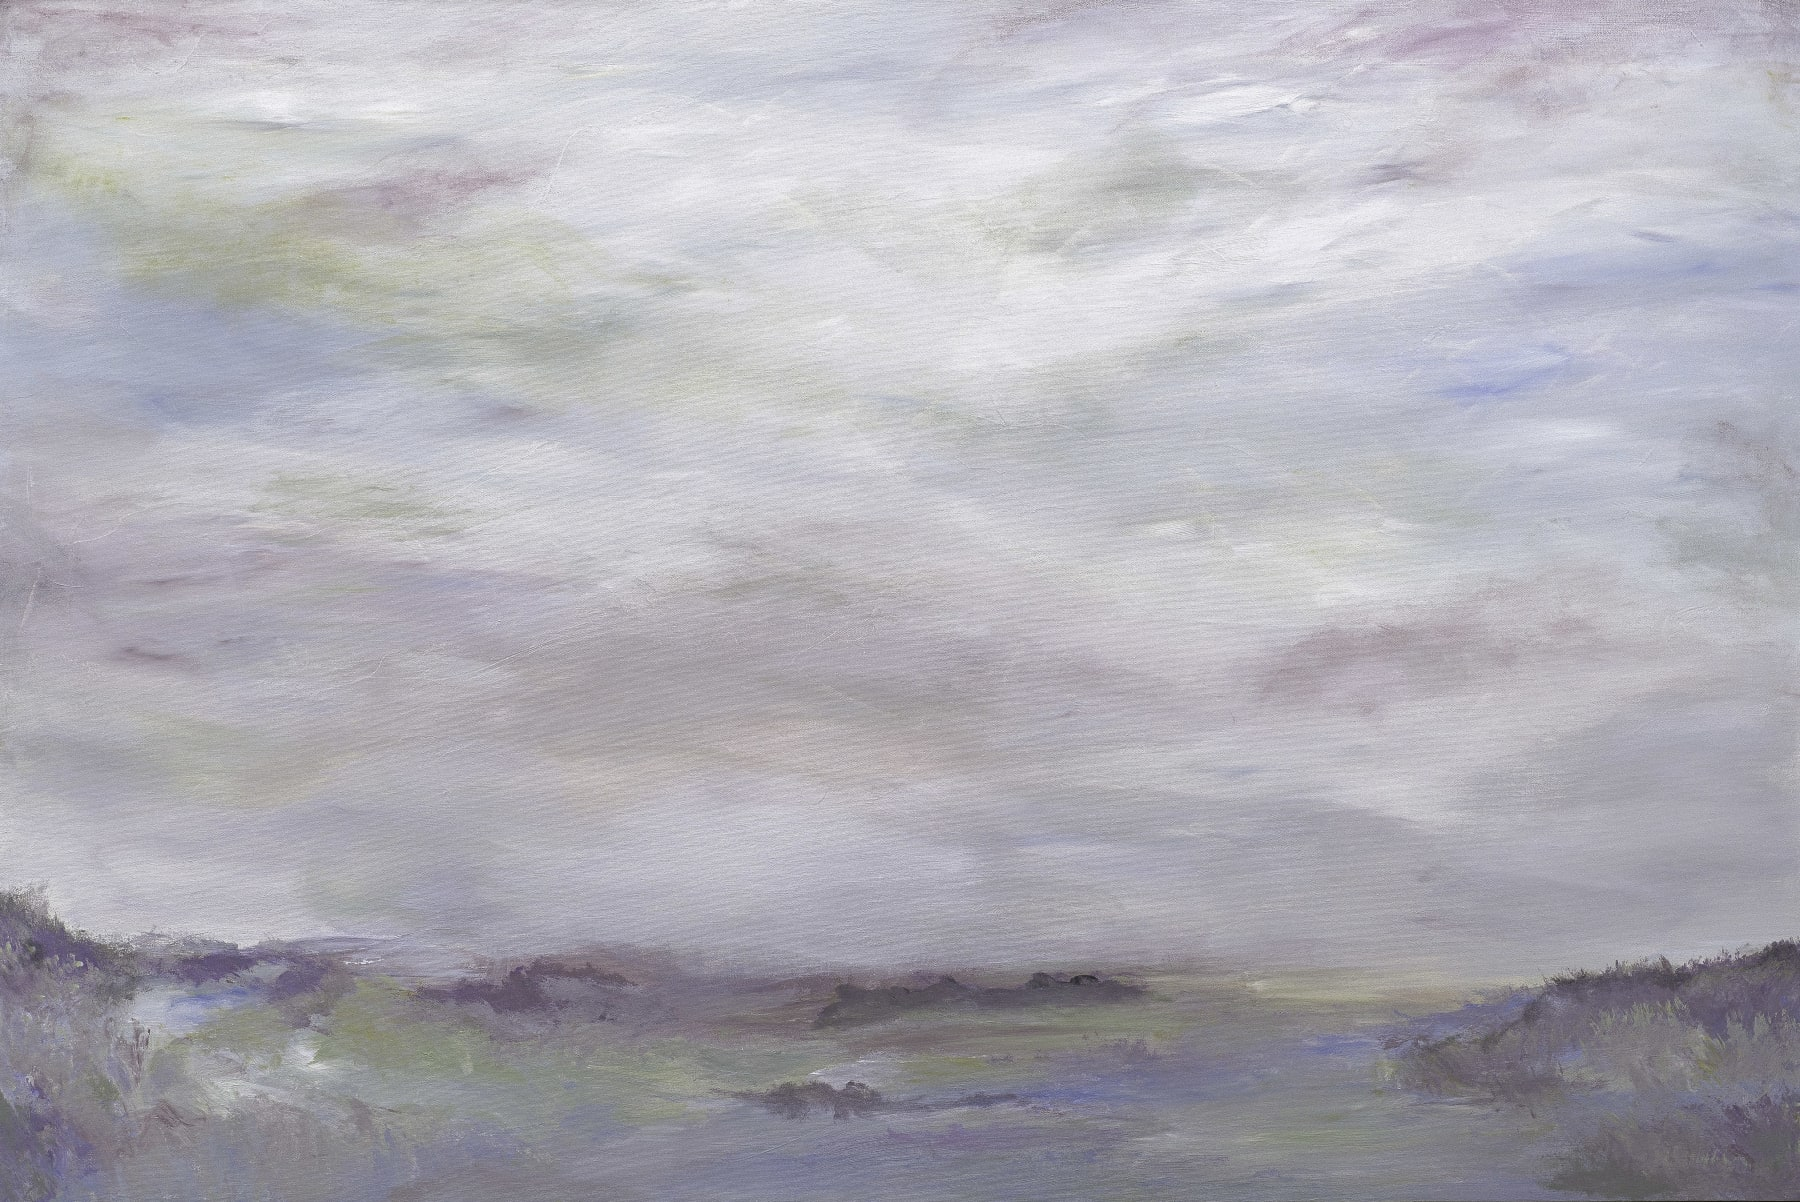 Patricia Qualls, Carmel Lagoon, 2020